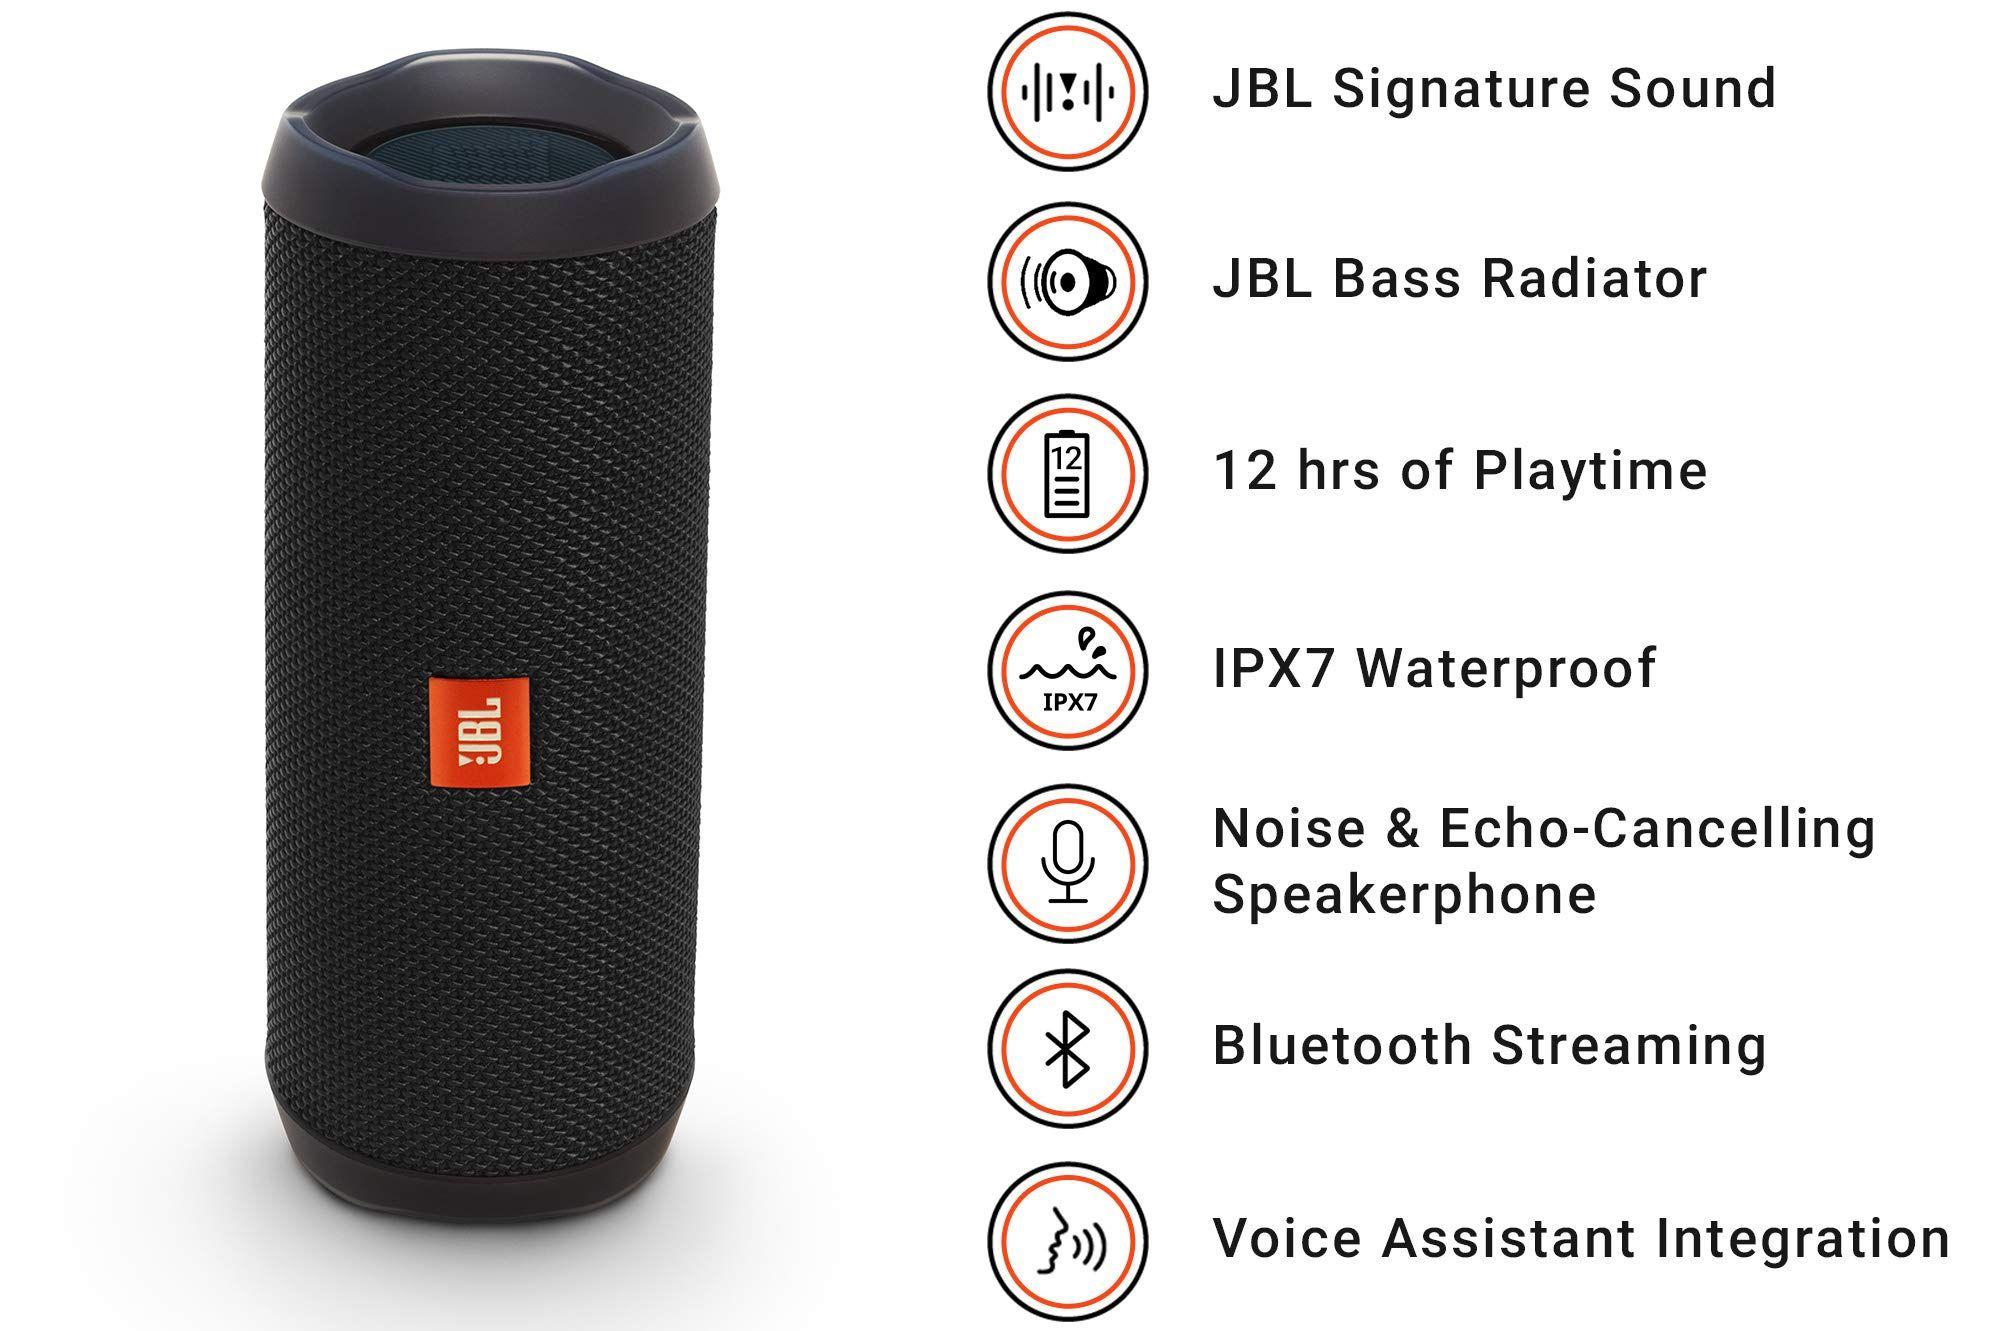 Jbl Flip 4 Waterproof Portable Bluetooth Speaker Black Waterpro Bluetooth Speakers Portable Waterproof Portable Bluetooth Speaker Wireless Speakers Portable